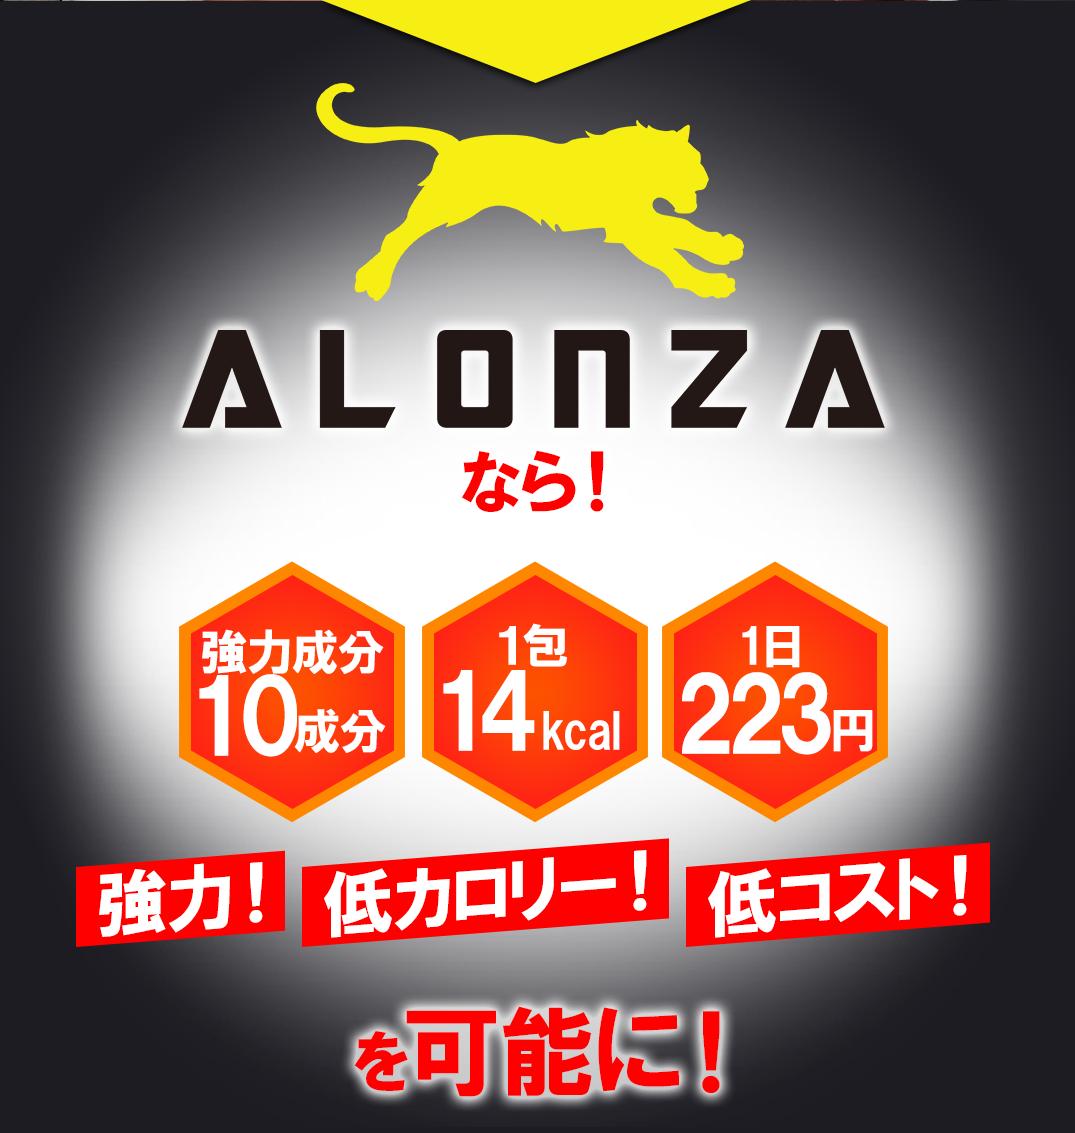 ALONZAなら!強力成分10成分 一包14kcal 1日223円 強力!低カロリー!低コスト!を可能に!